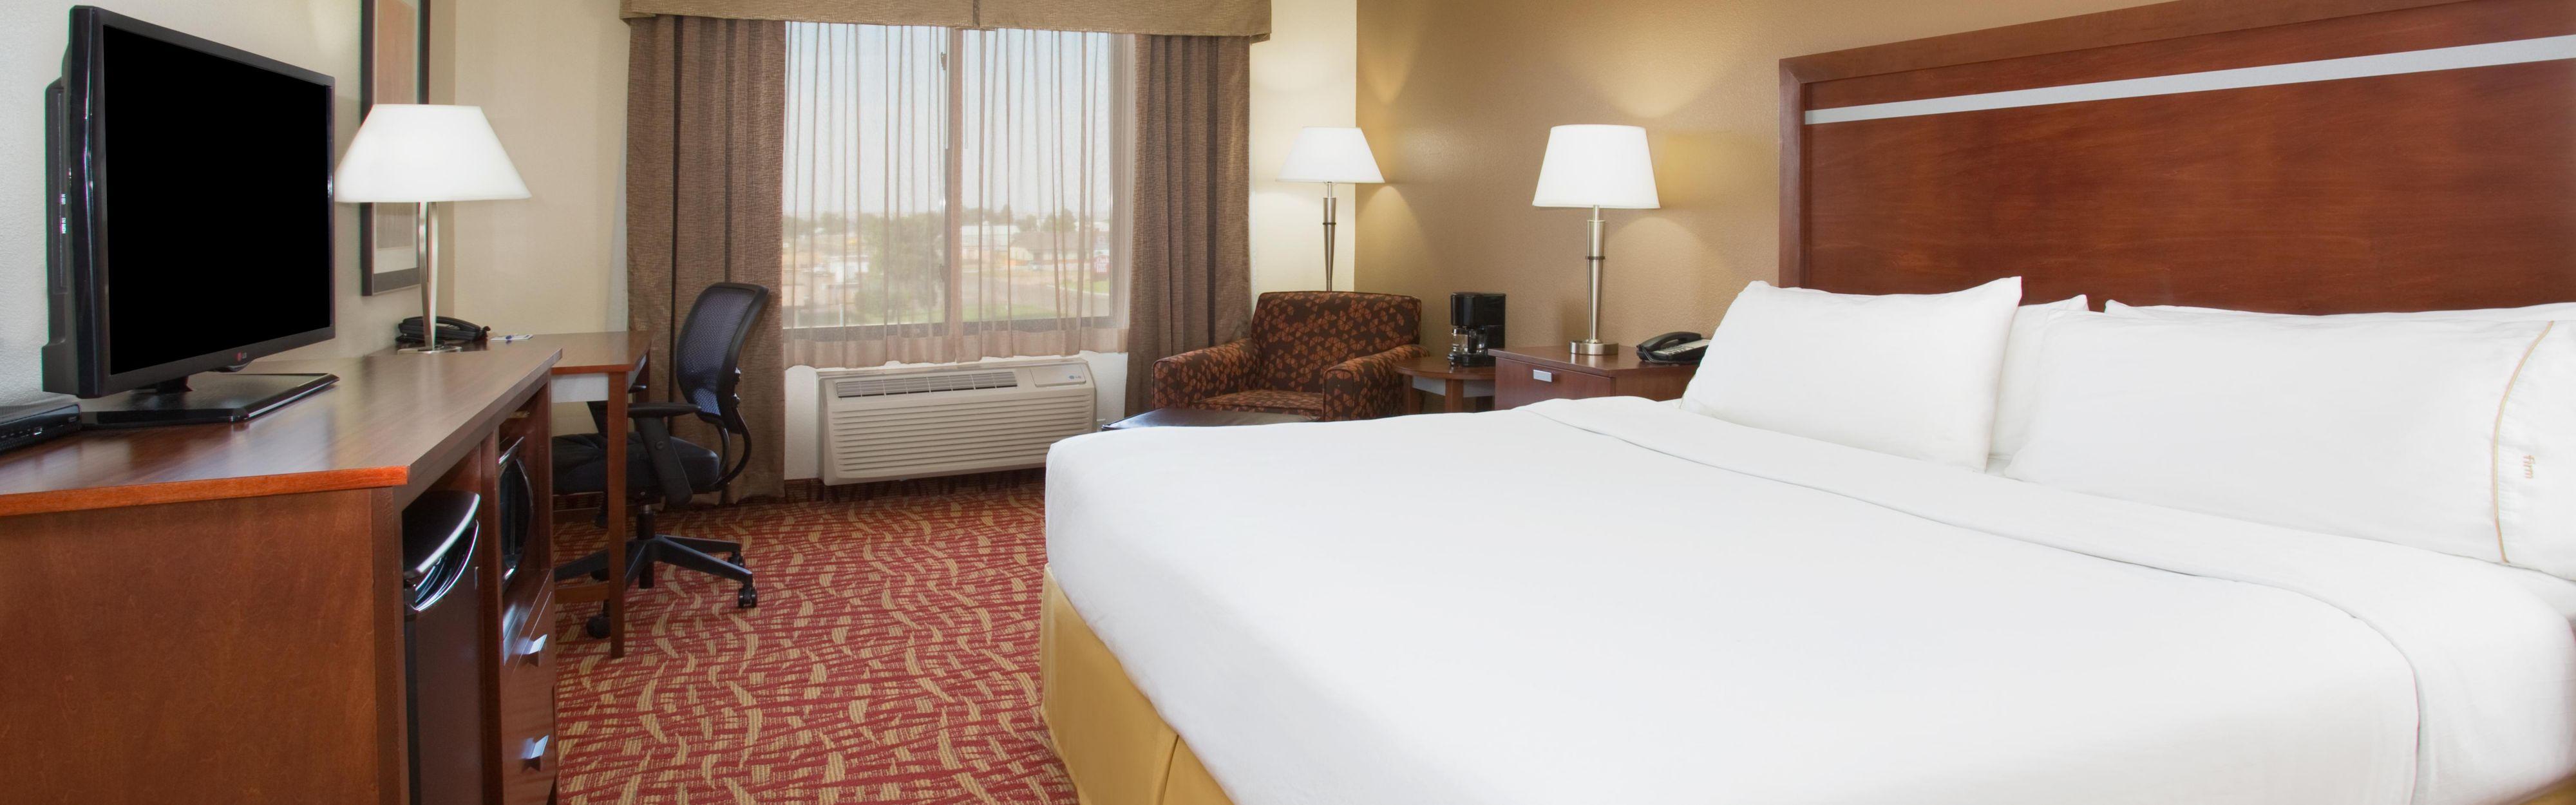 Holiday Inn Express & Suites Glendive image 1